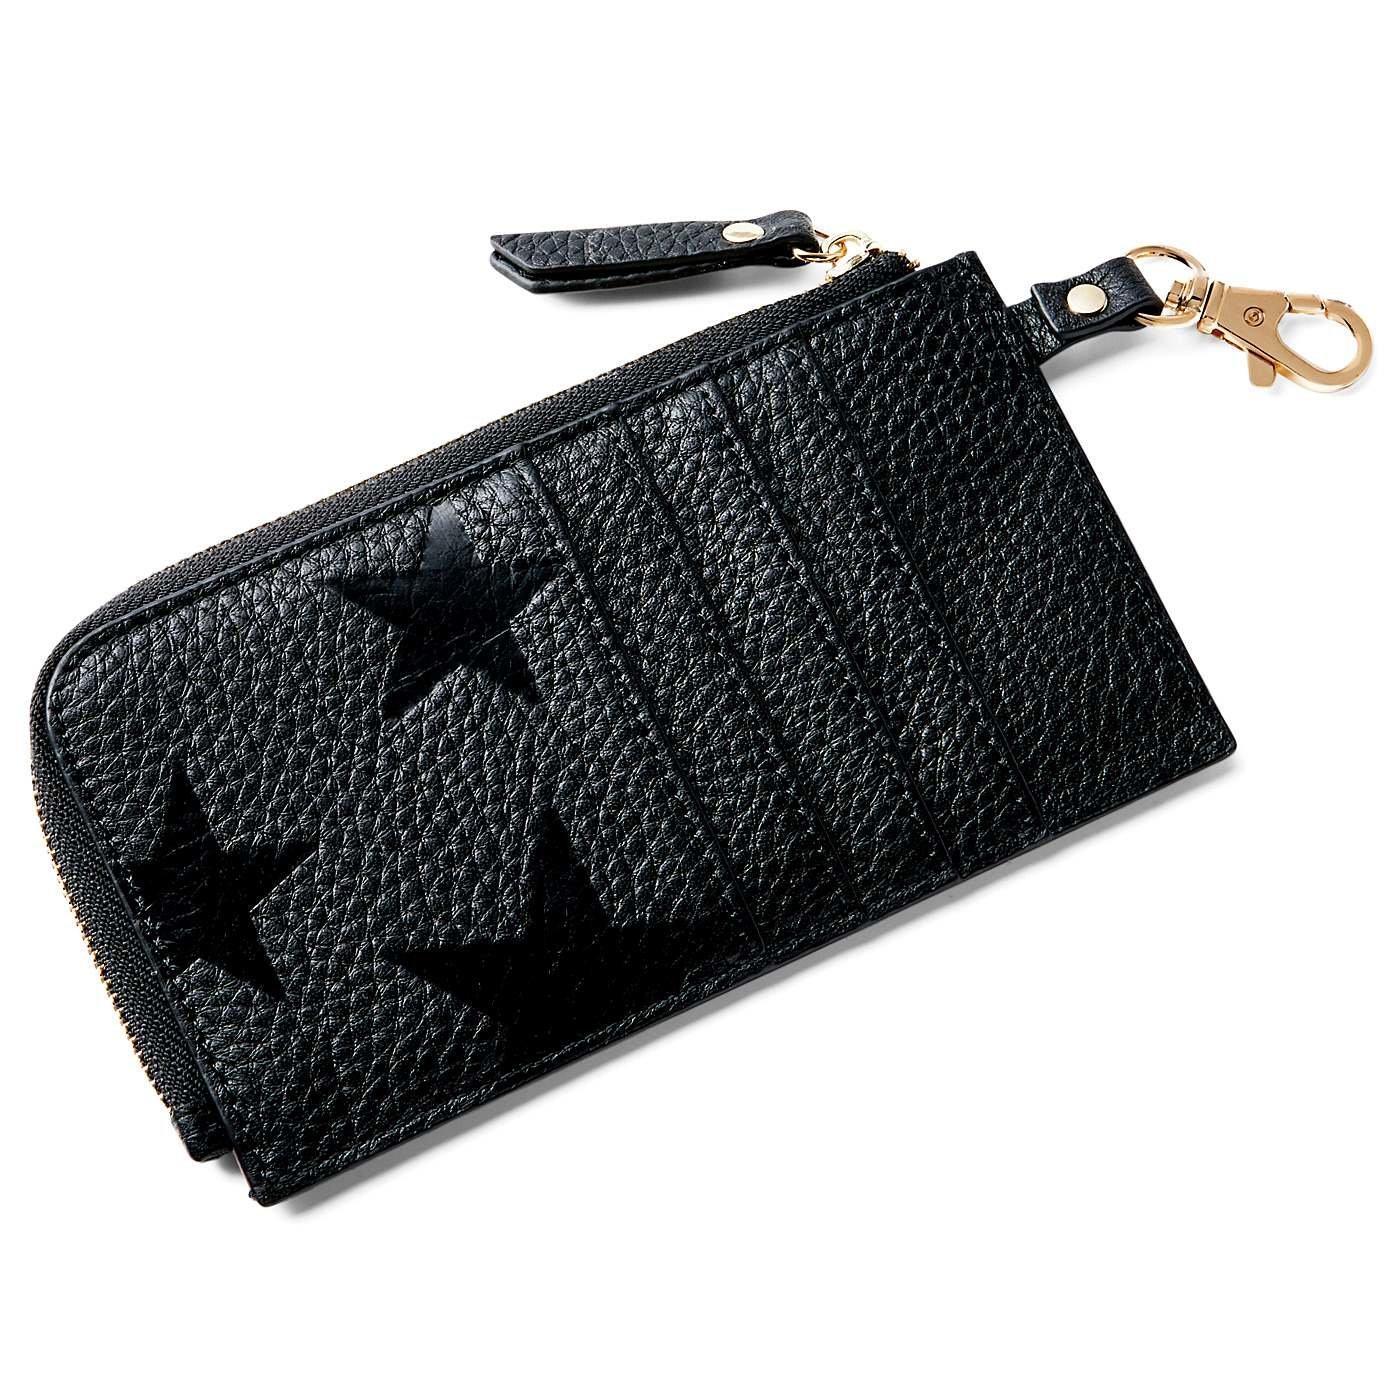 IEDIT[イディット] 本革が大人にうれしい スターエンボス加工のスリムミニ財布〈ブラック〉